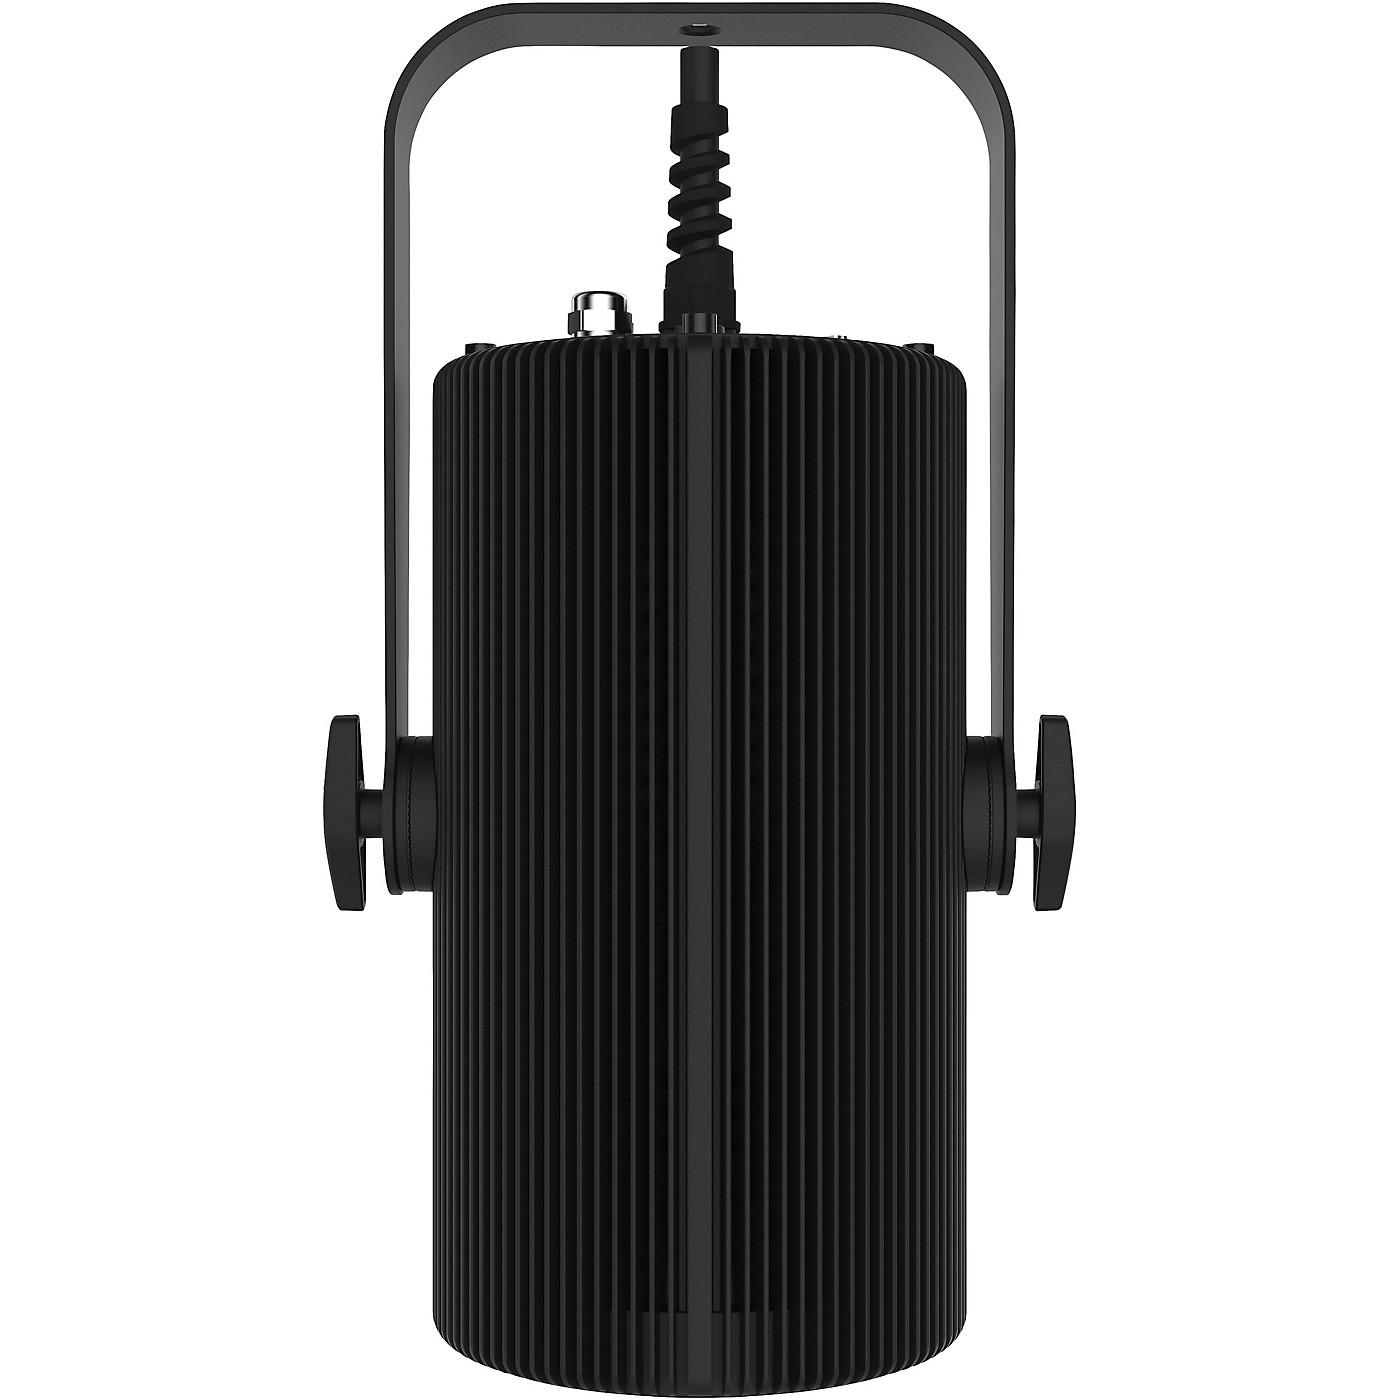 CHAUVET Professional Ovation H-265WW Warm White LED Light thumbnail